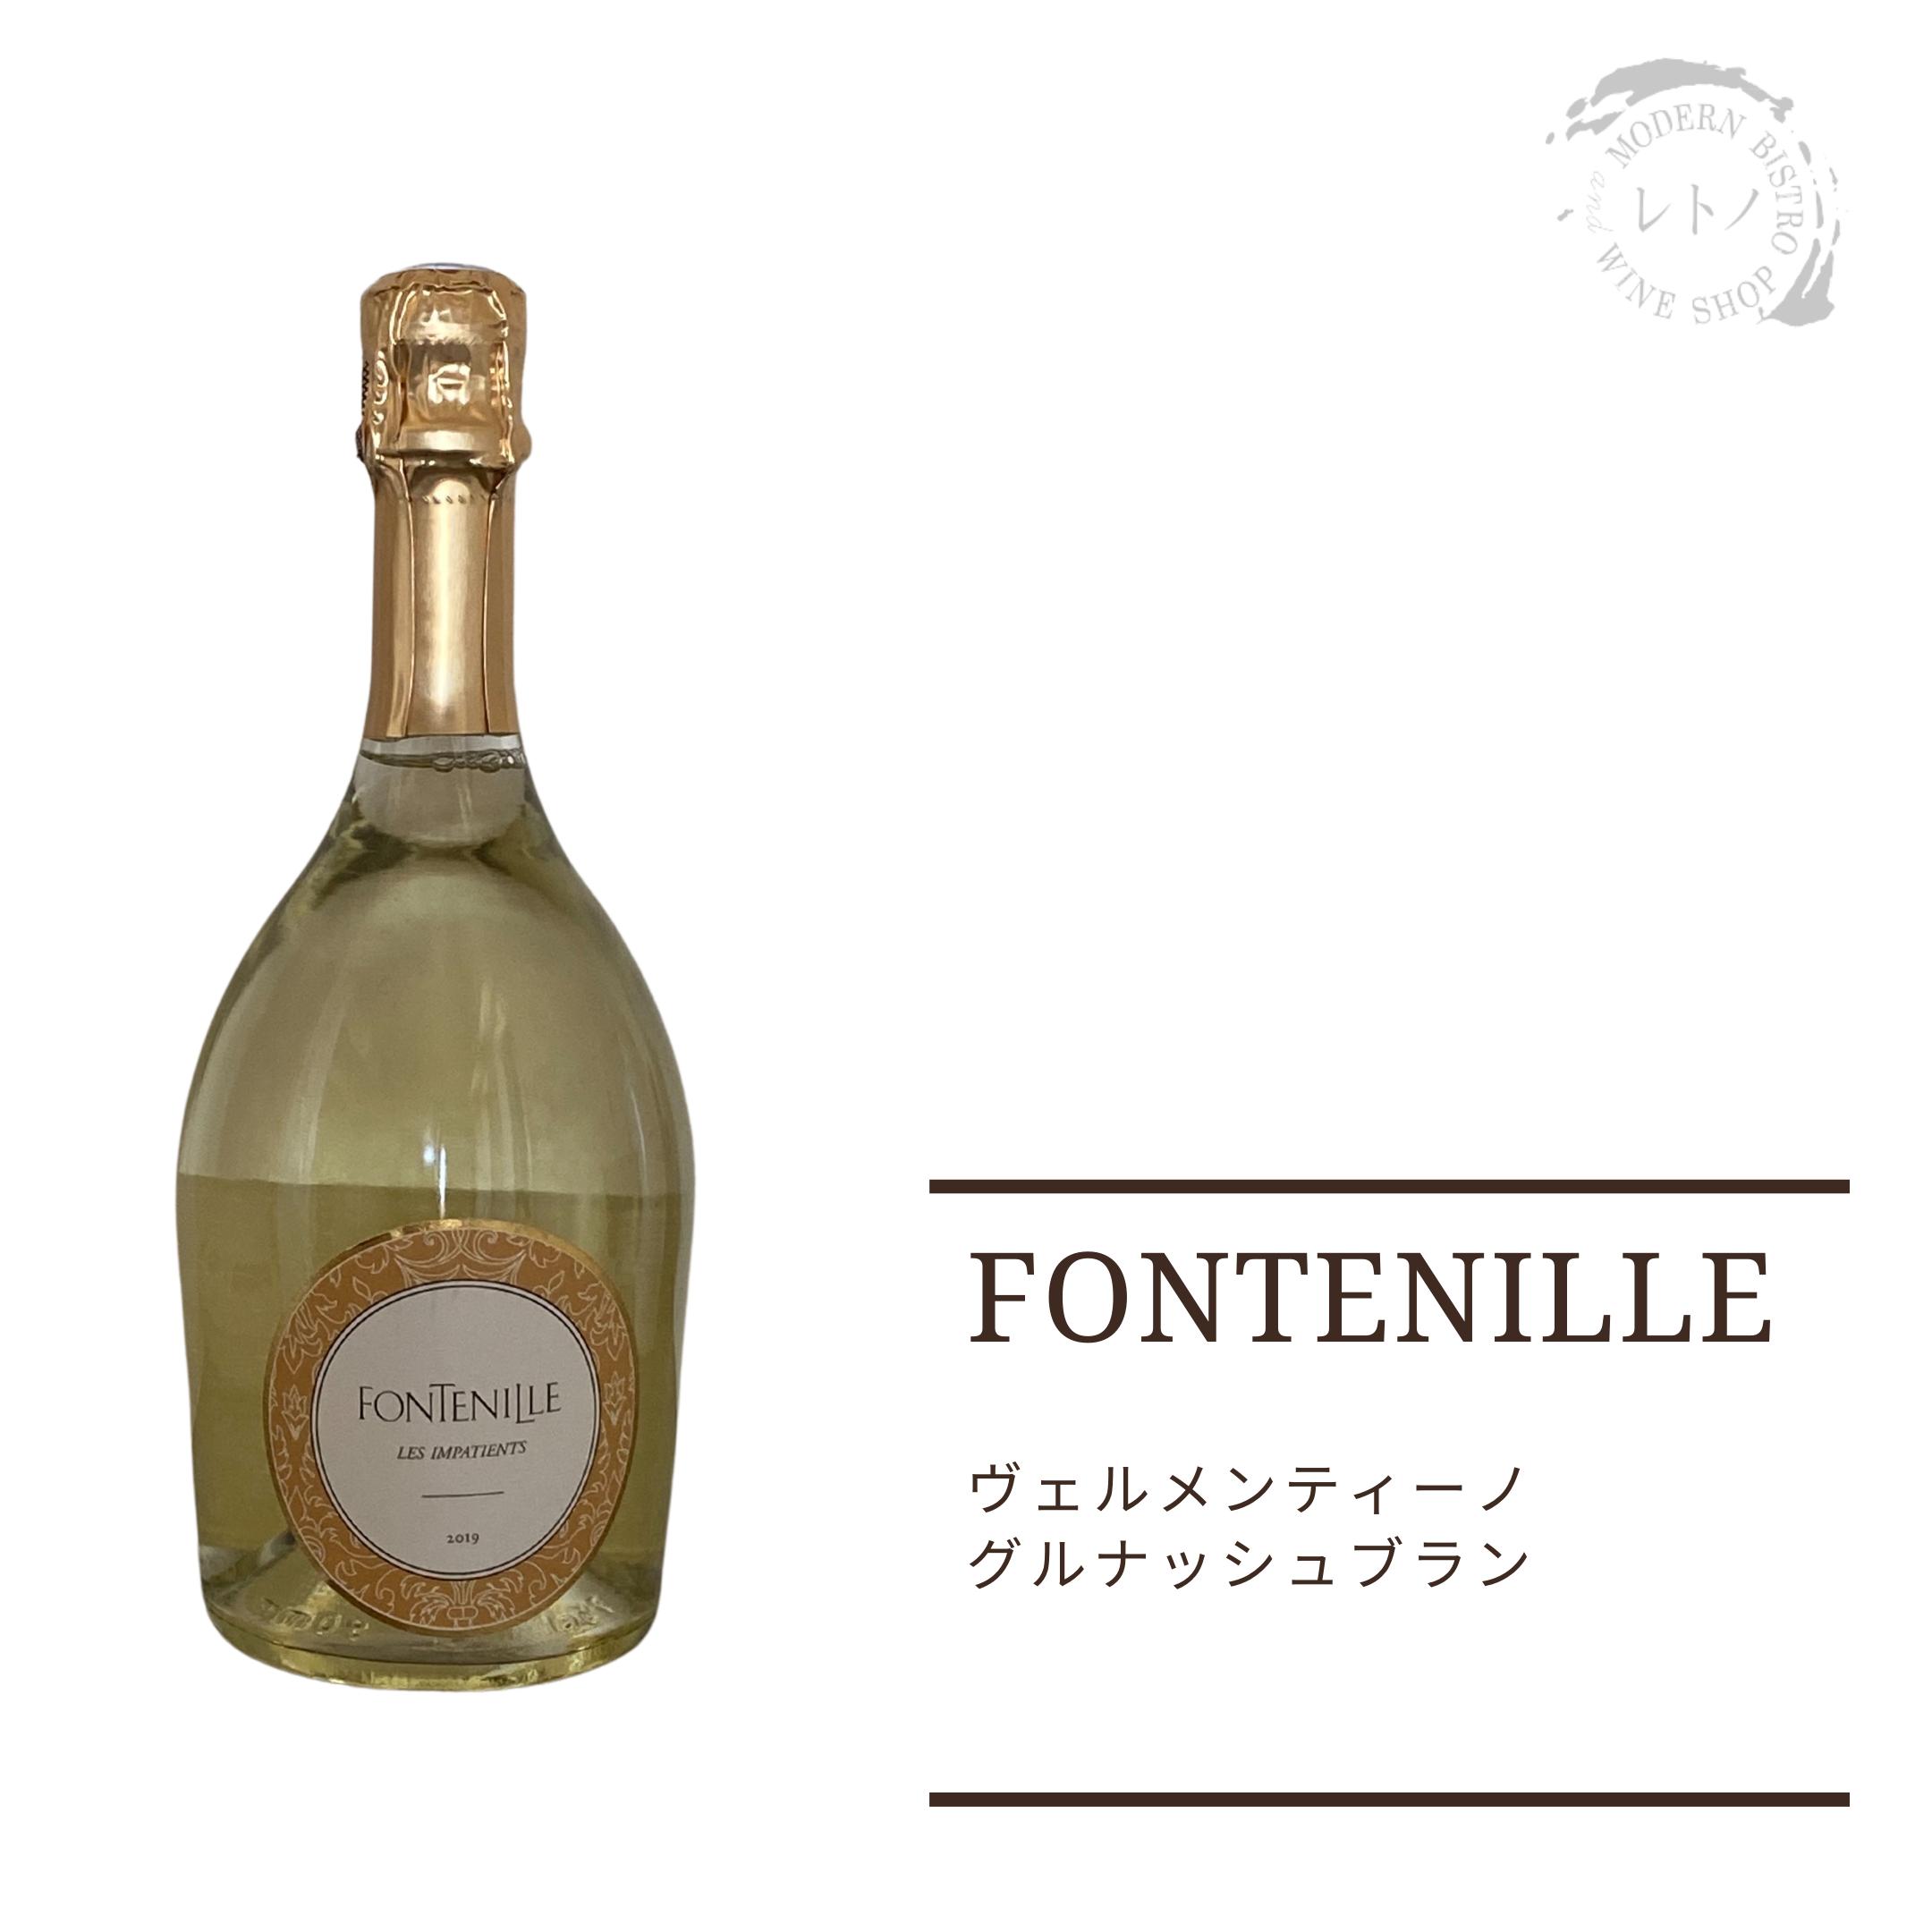 2019 FONTENILLE PETILLANT, FRANCE, ROLLE+